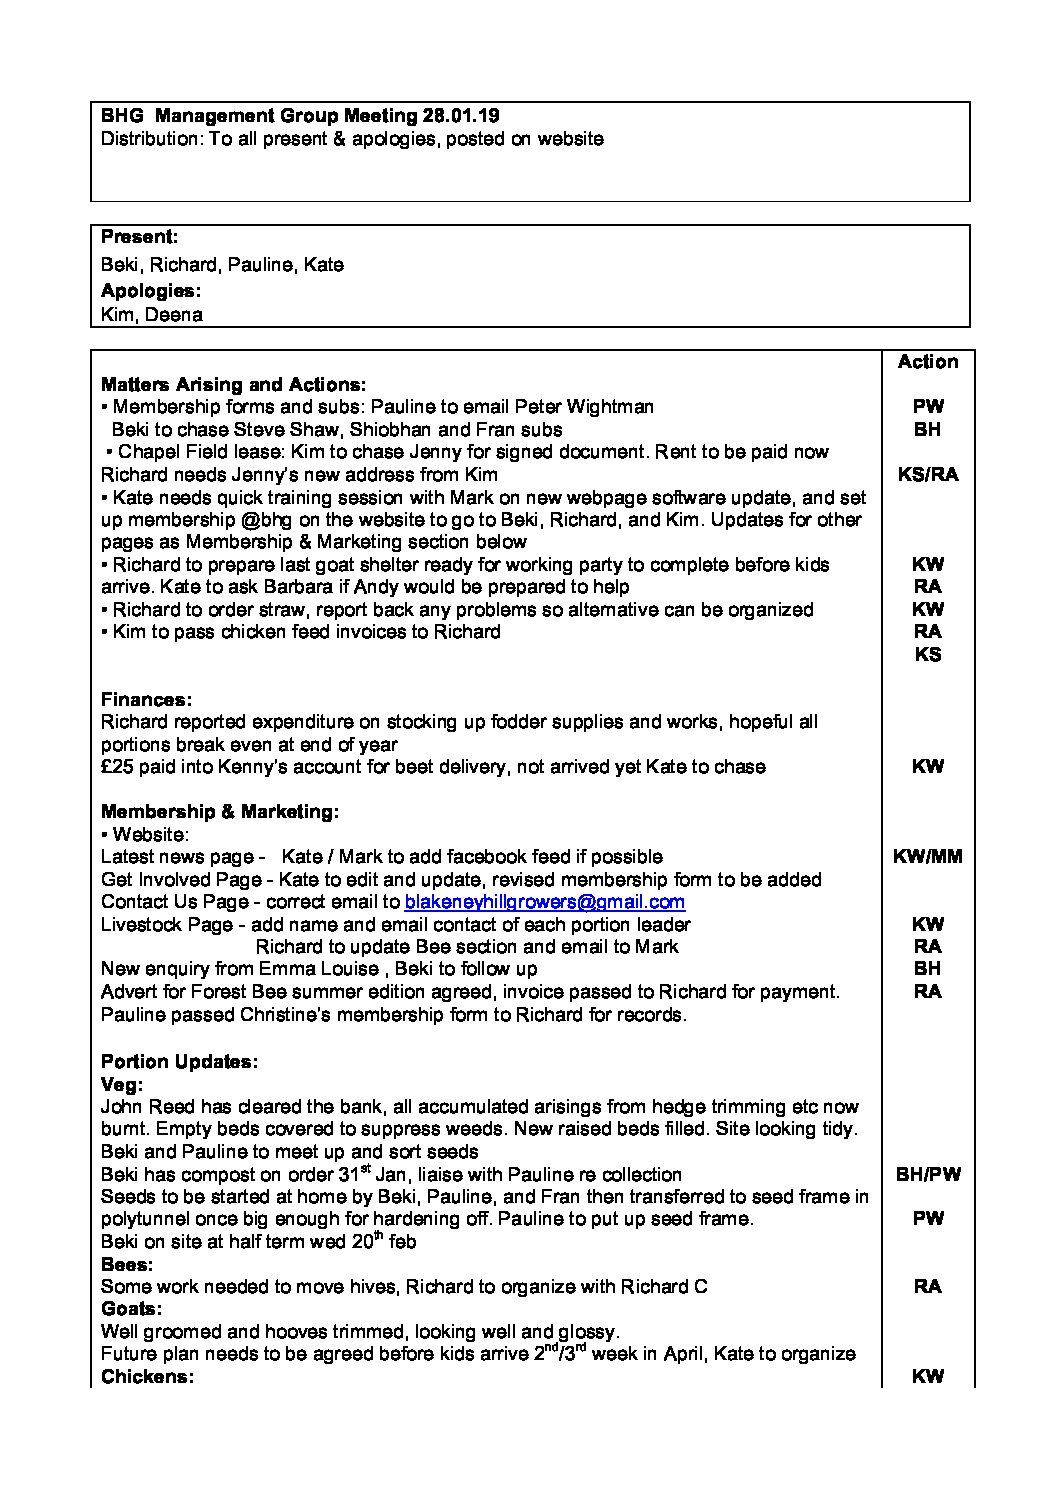 BHG-Minutes-28.01.19-pdf-1